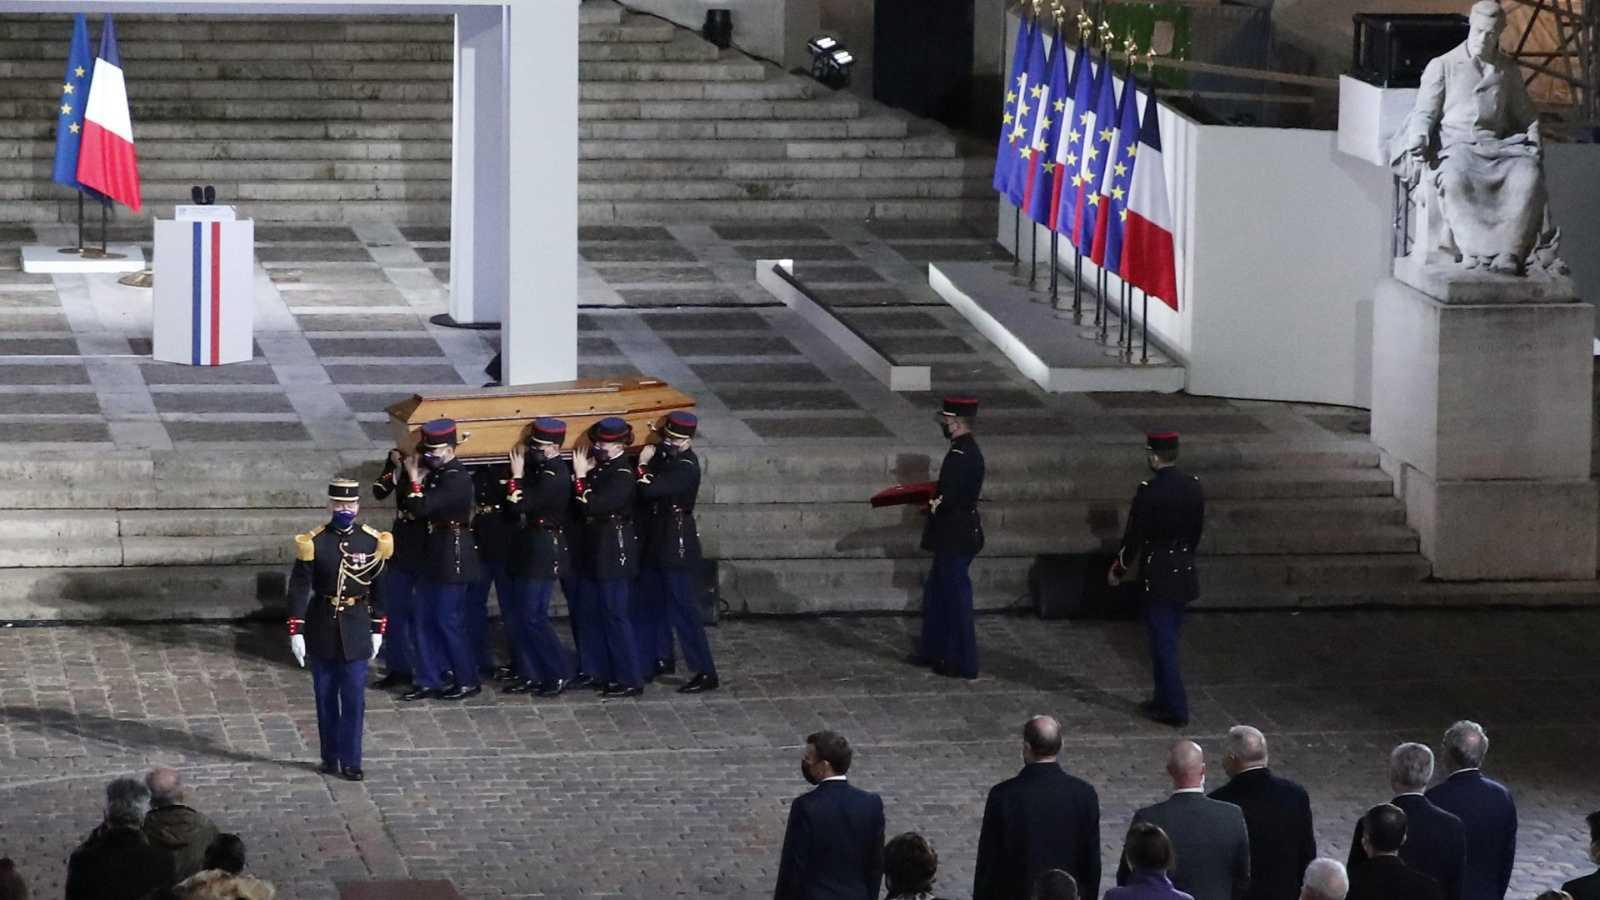 24 horas - Francia homenajea al profesor asesinado por enseñar caricaturas de Mahoma - Escuchar ahora